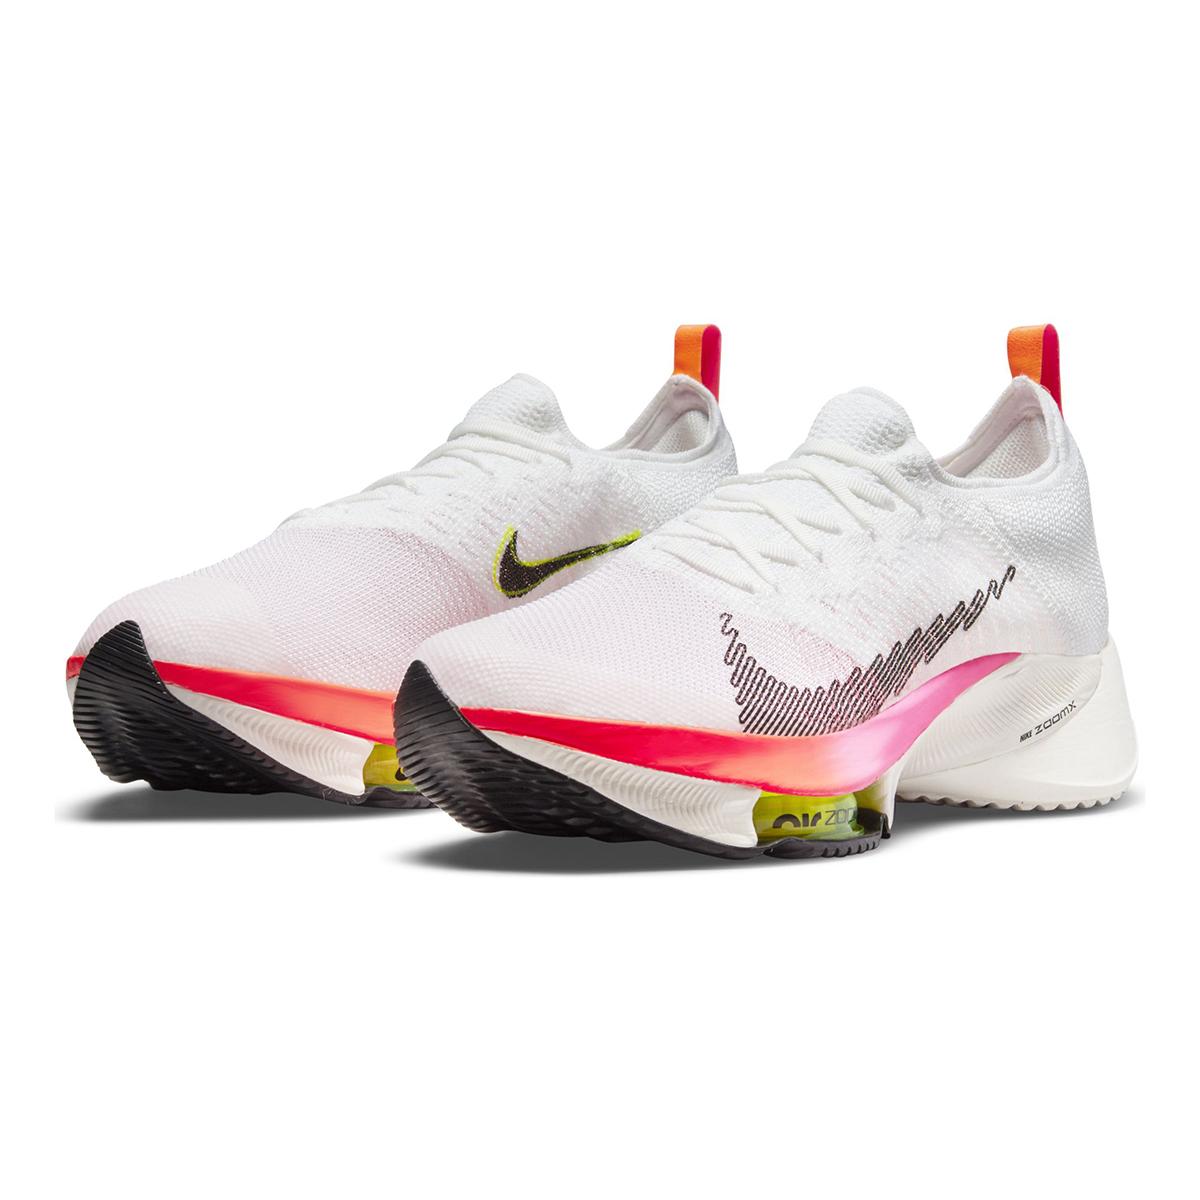 Men's Nike Air Zoom Tempo Next% Flyknit Running Shoe - Color: Rawdacious - Size: 6 - Width: Regular, Rawdacious, large, image 4